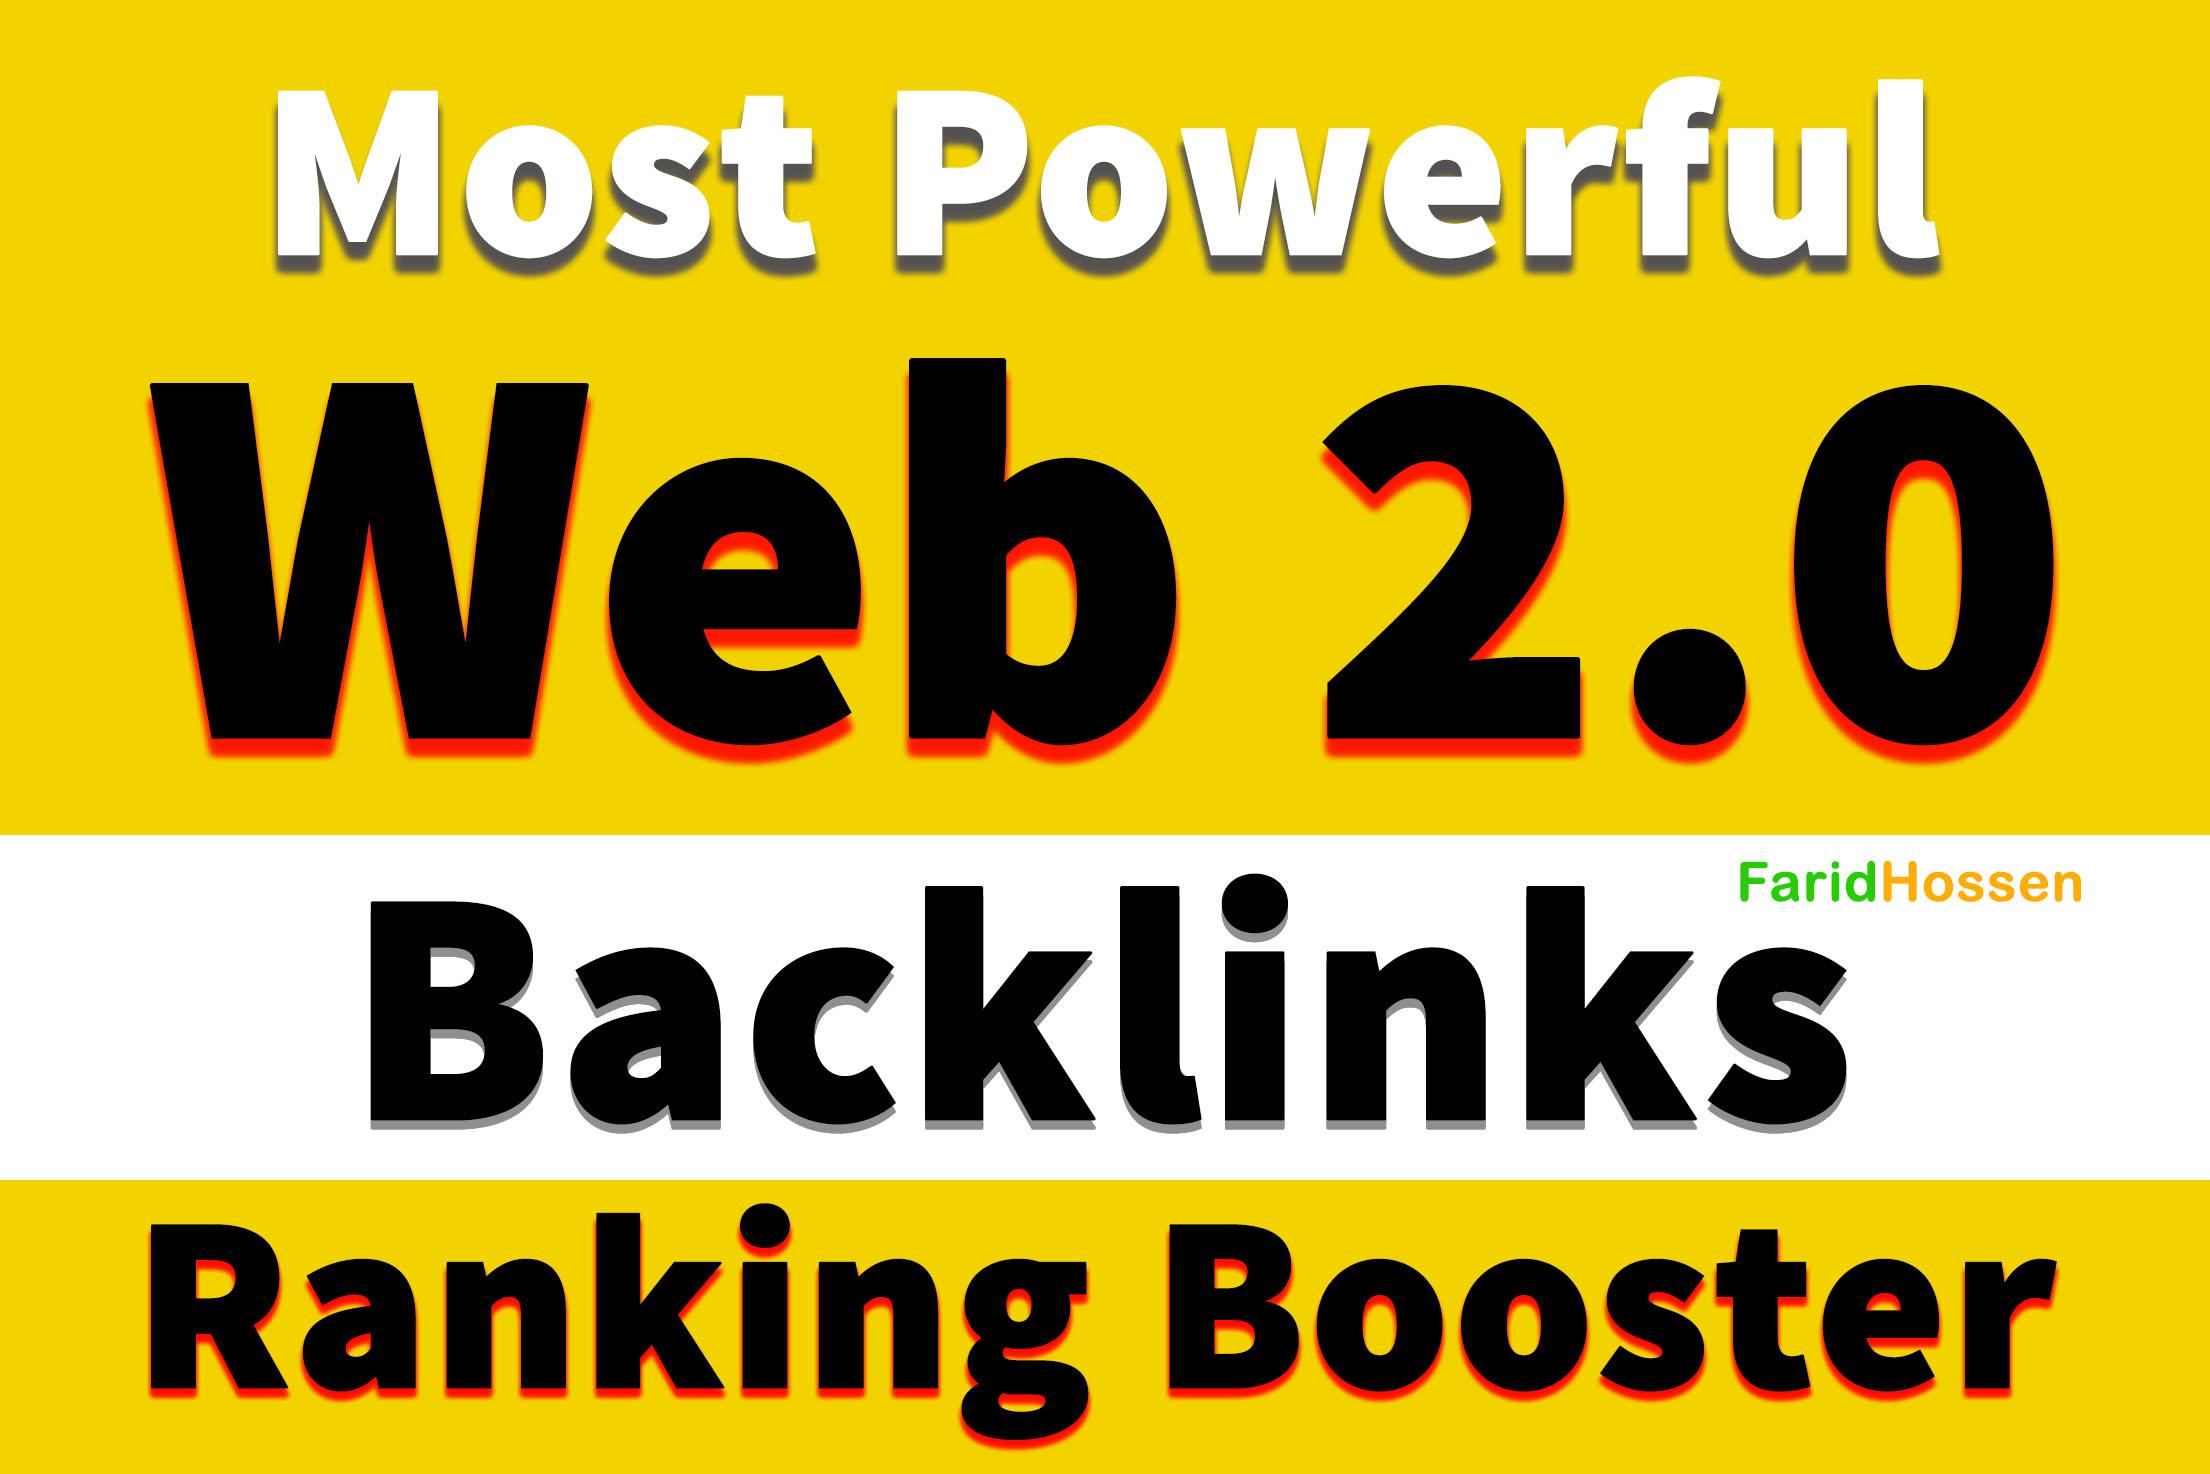 Handmade 20 Web2.0 Buffer Blogs /Article Backlinks High Domain Authority